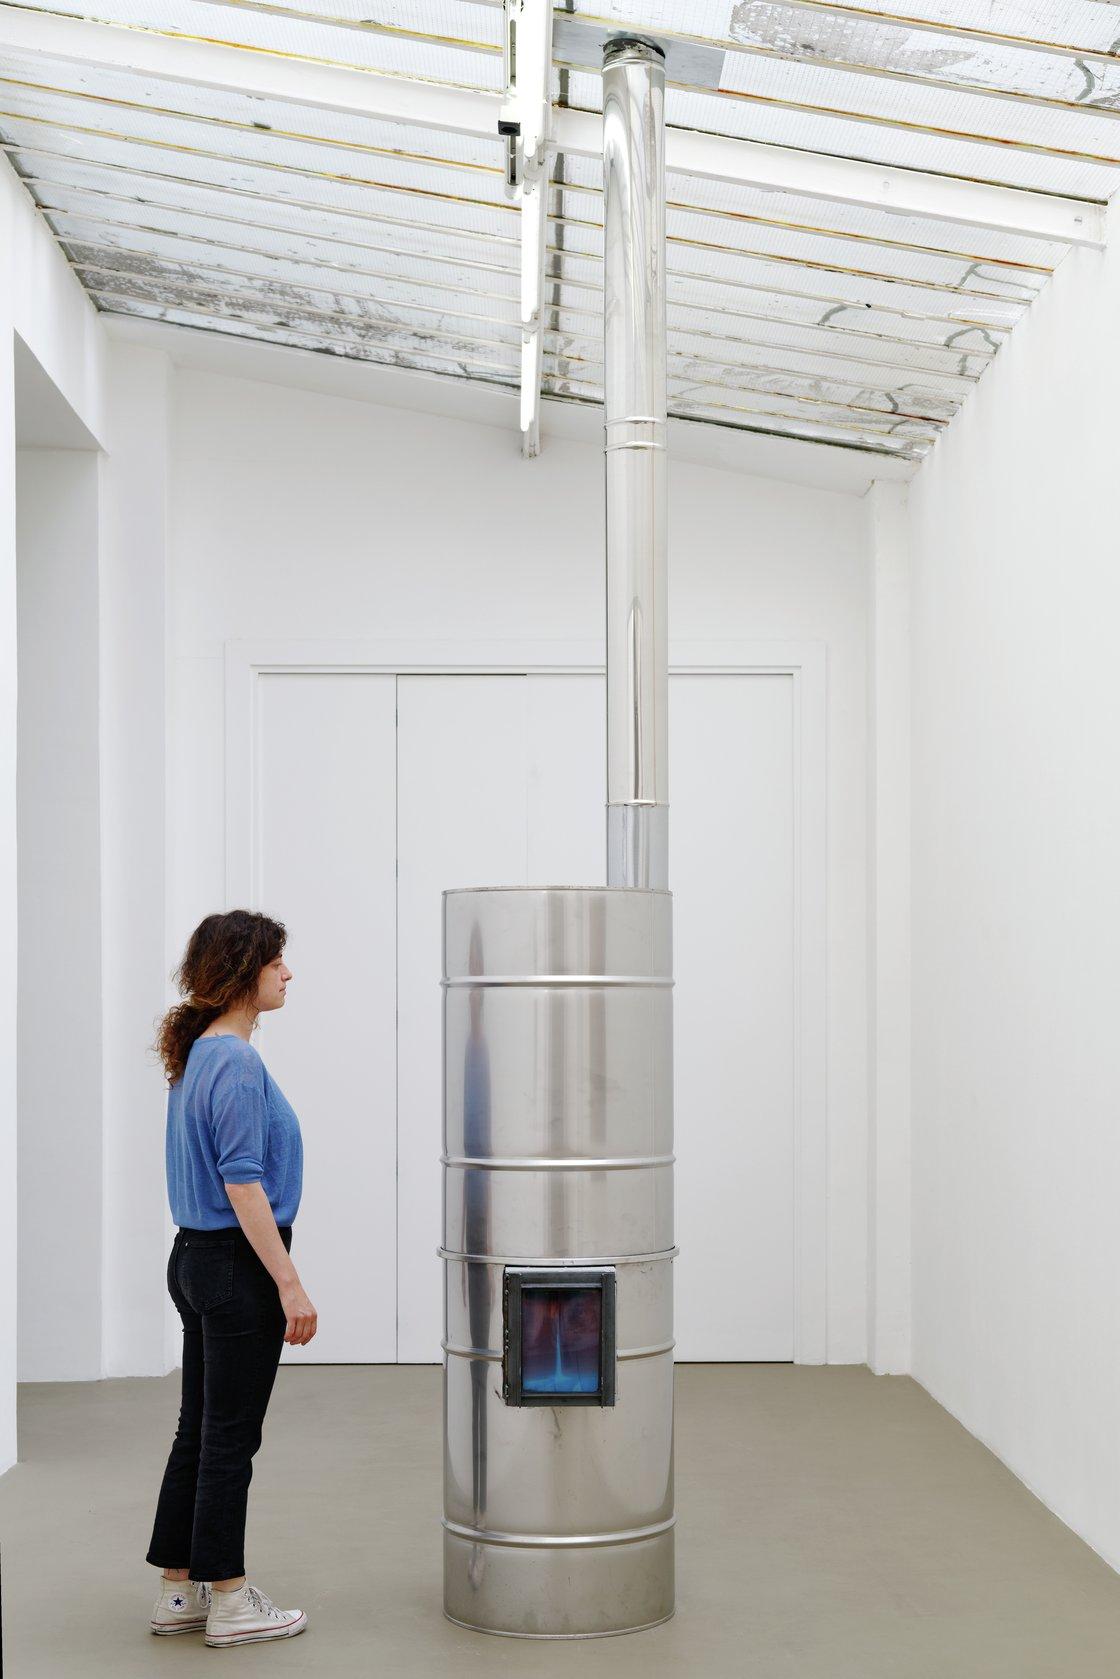 Oscar Tuazon, Inox Rocket, 2021